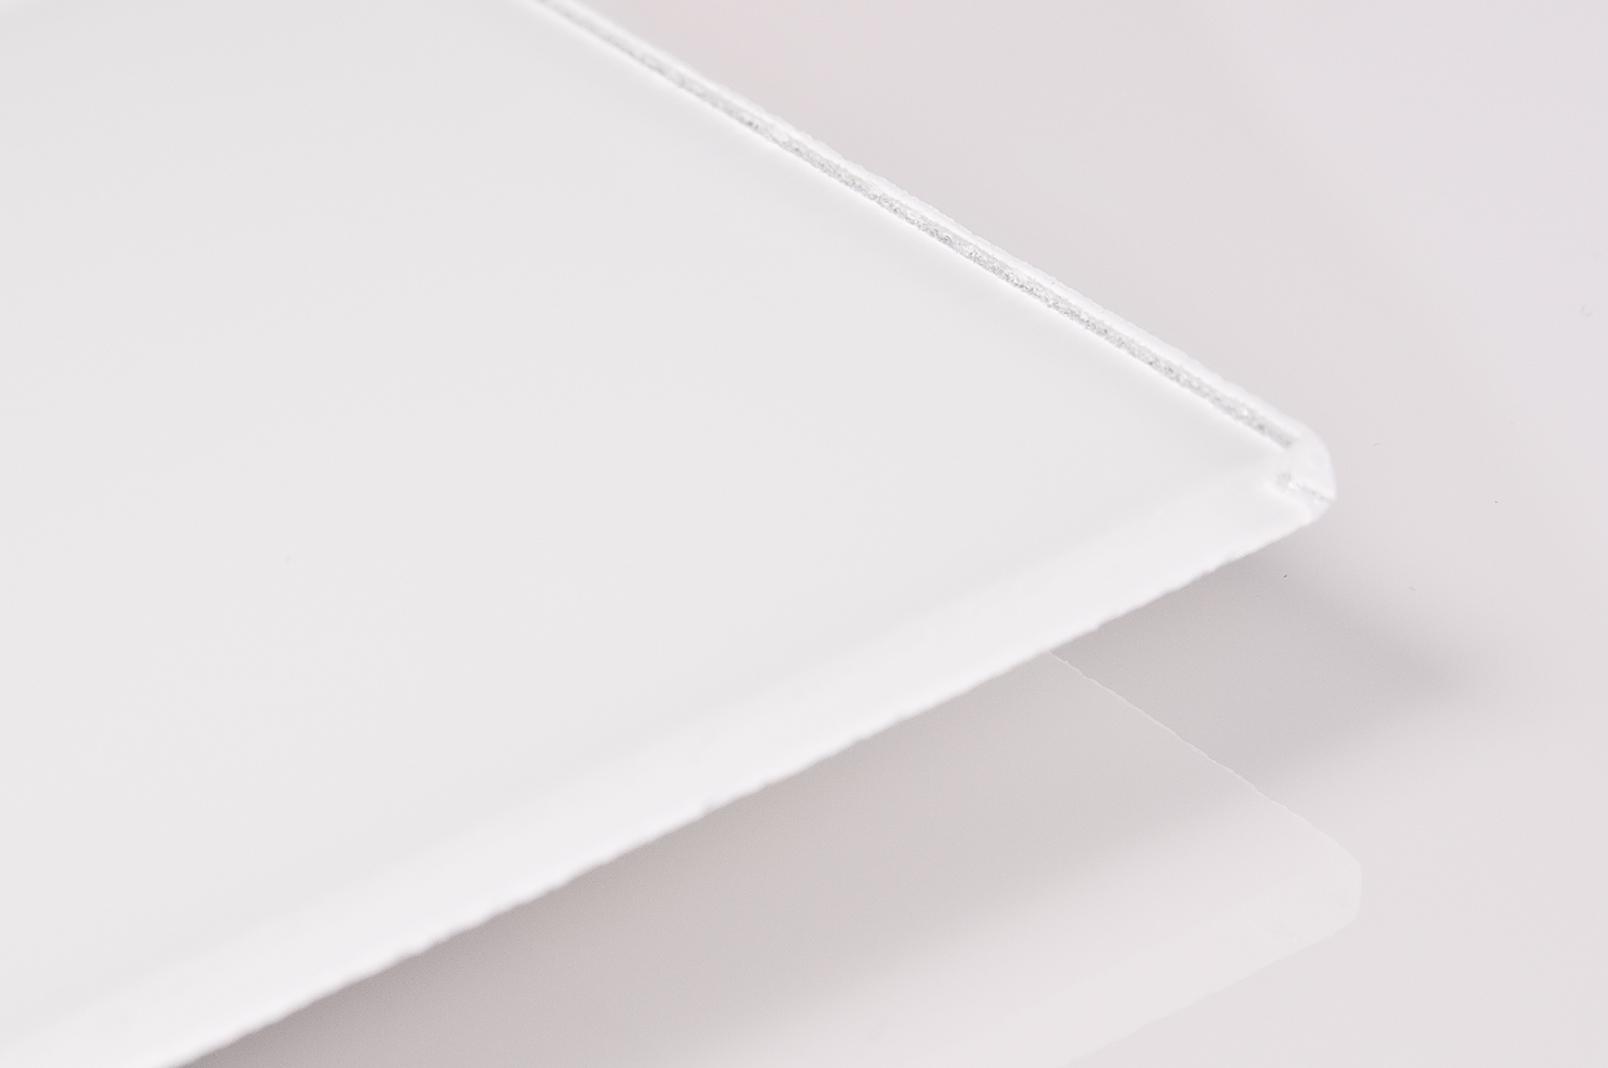 k chenr ckwand aus glas lacobel farbig max glas ganzglast ren glasschiebet ren. Black Bedroom Furniture Sets. Home Design Ideas